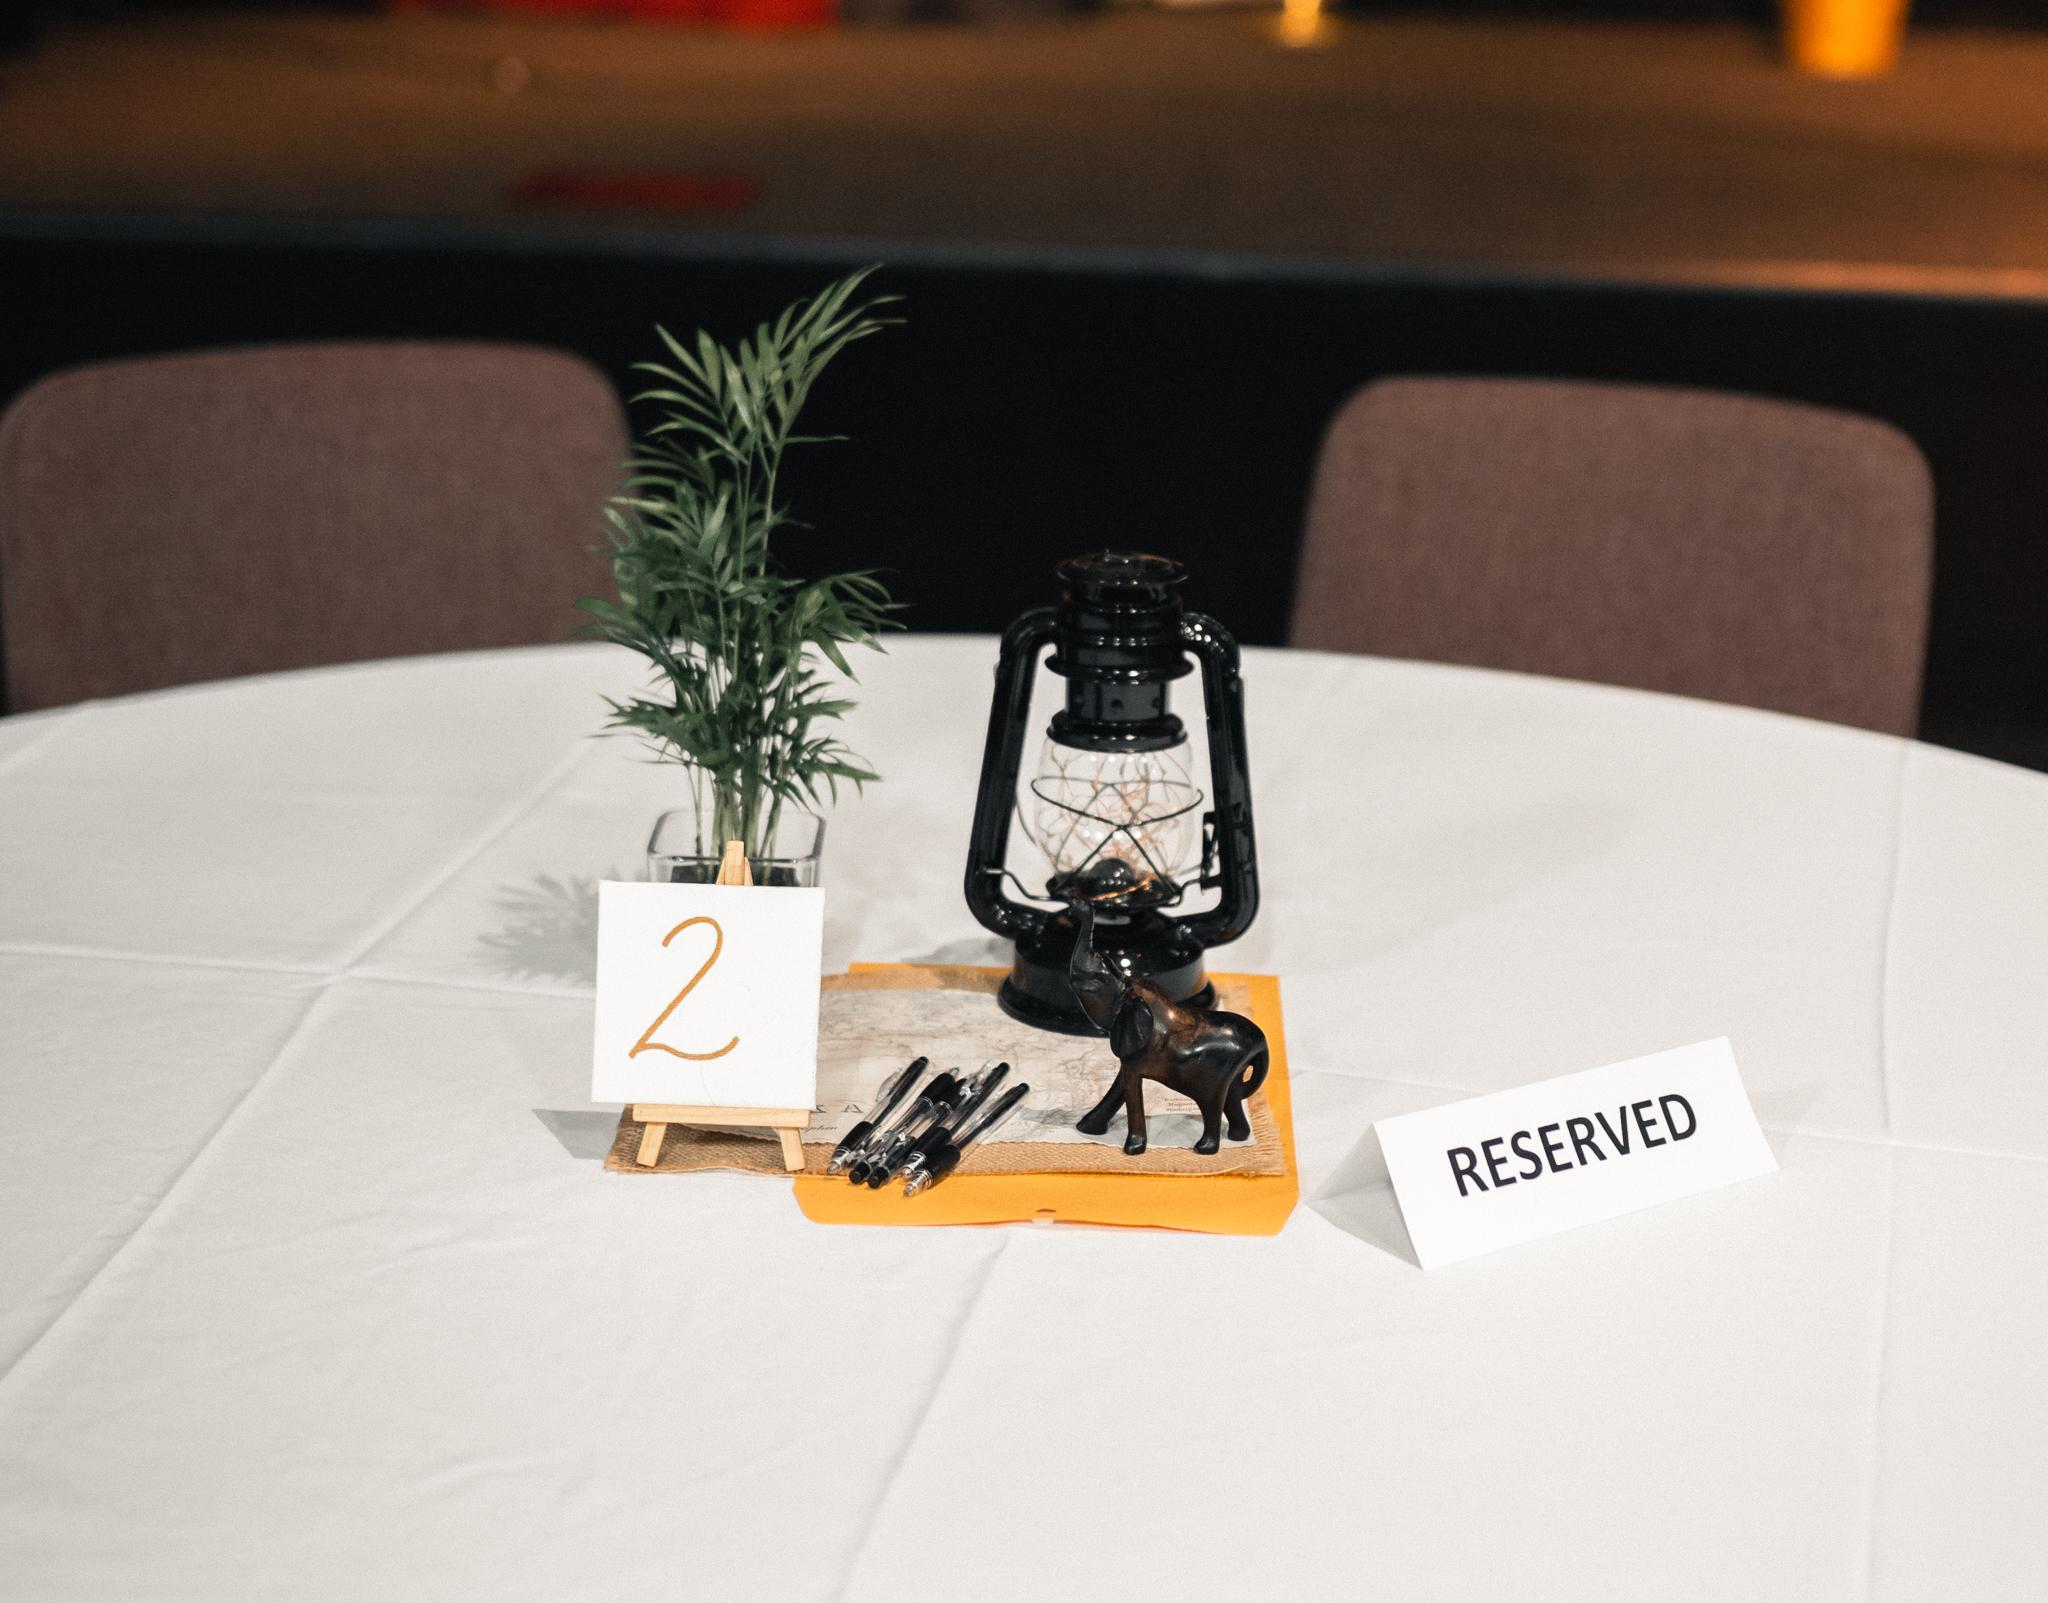 Banquet 2020 Update